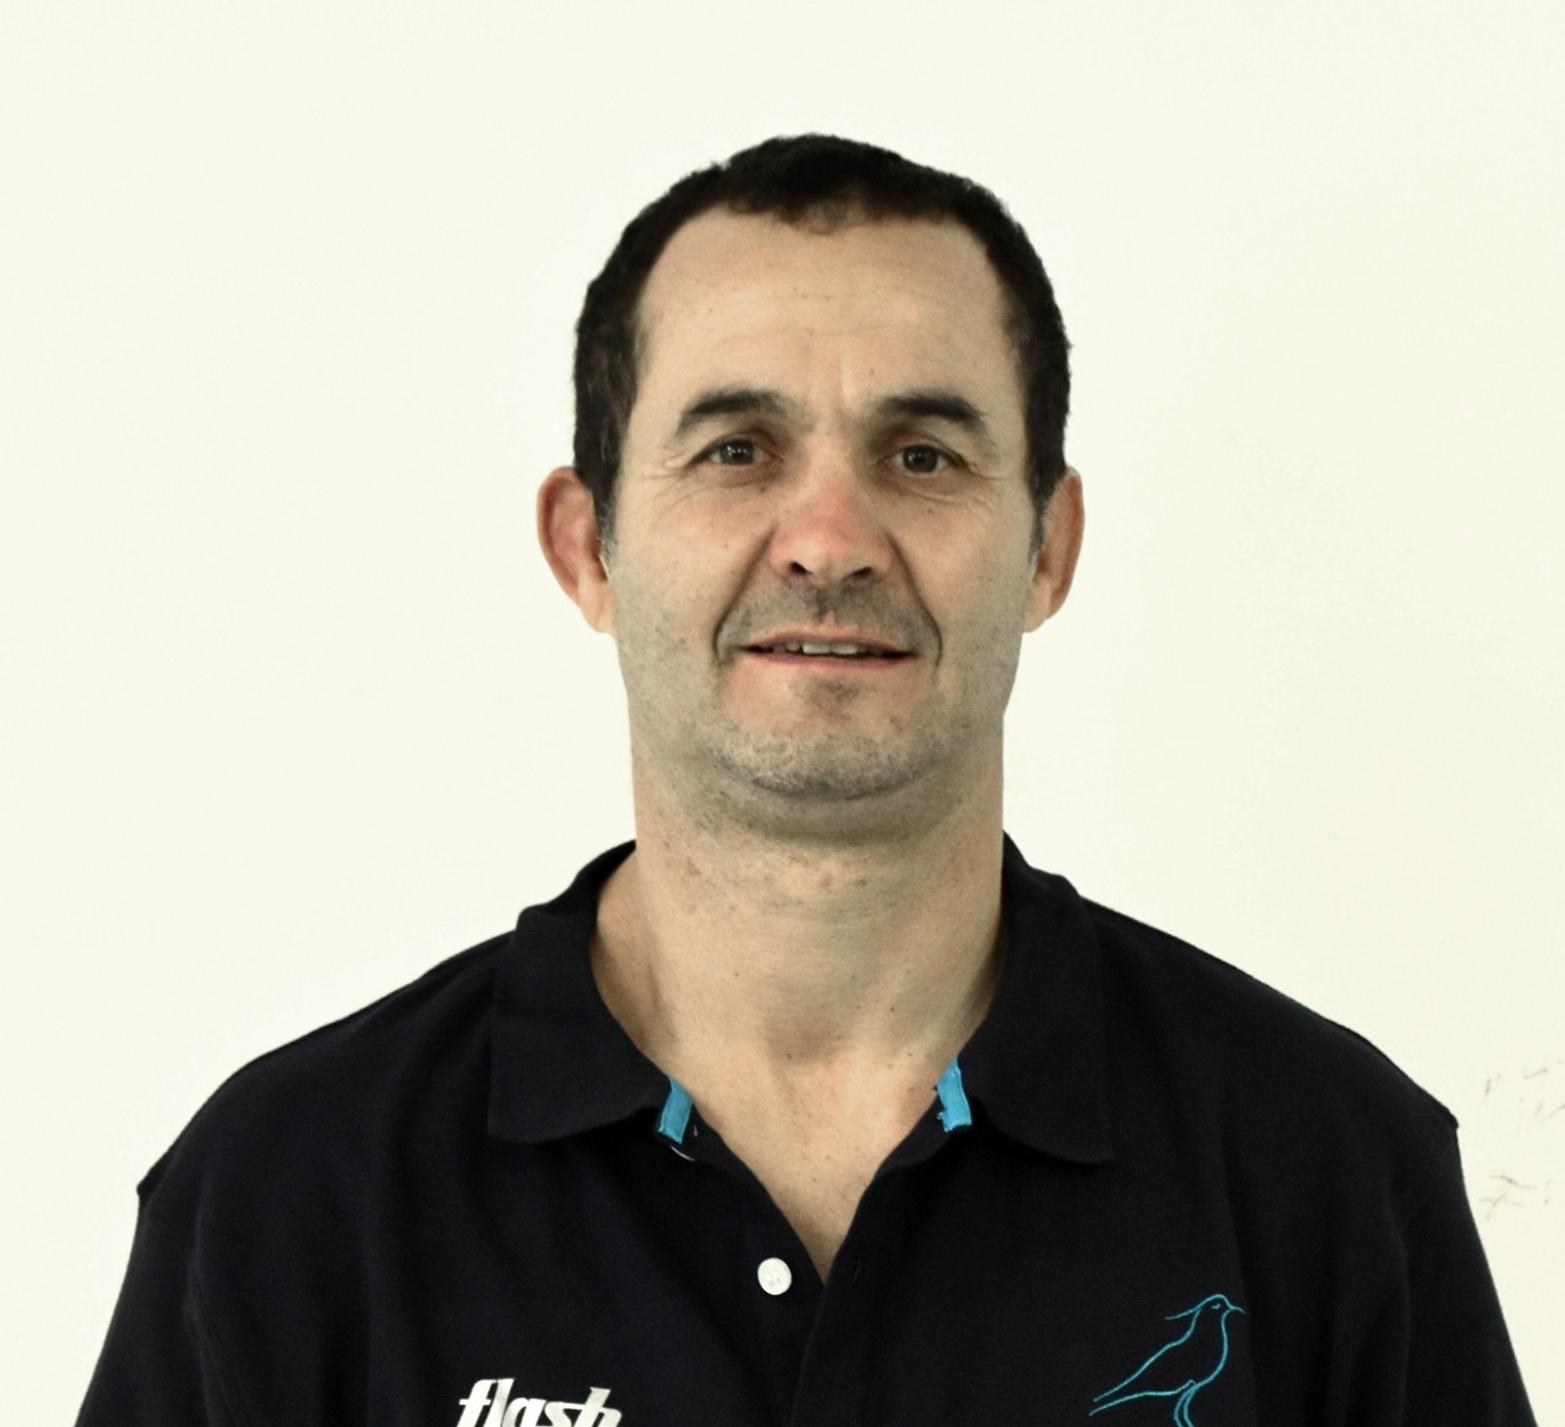 Esteban Meneses